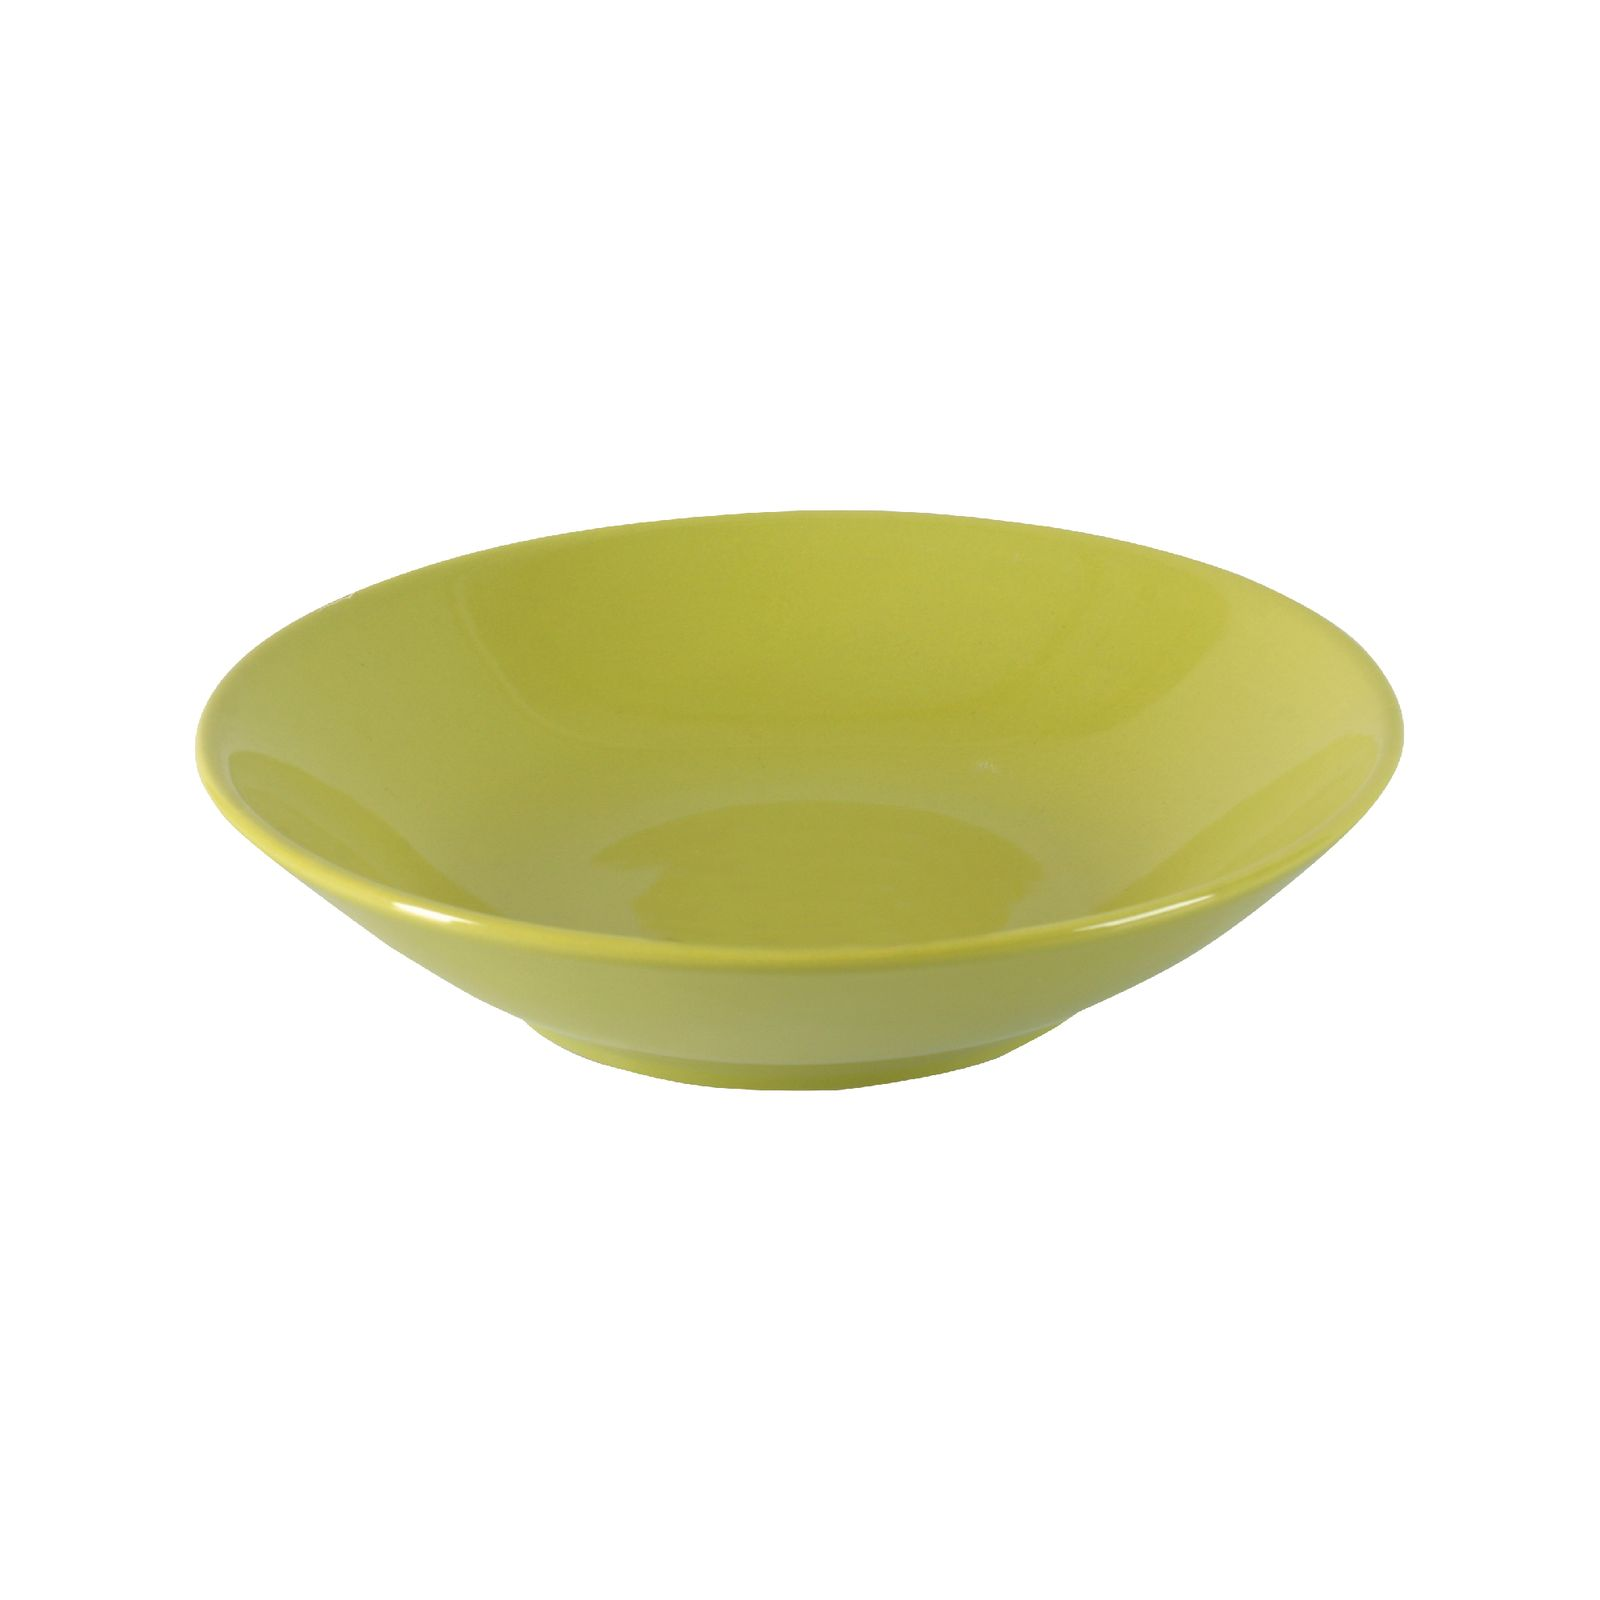 Soup plate Fusion Fresh 21cm lime green